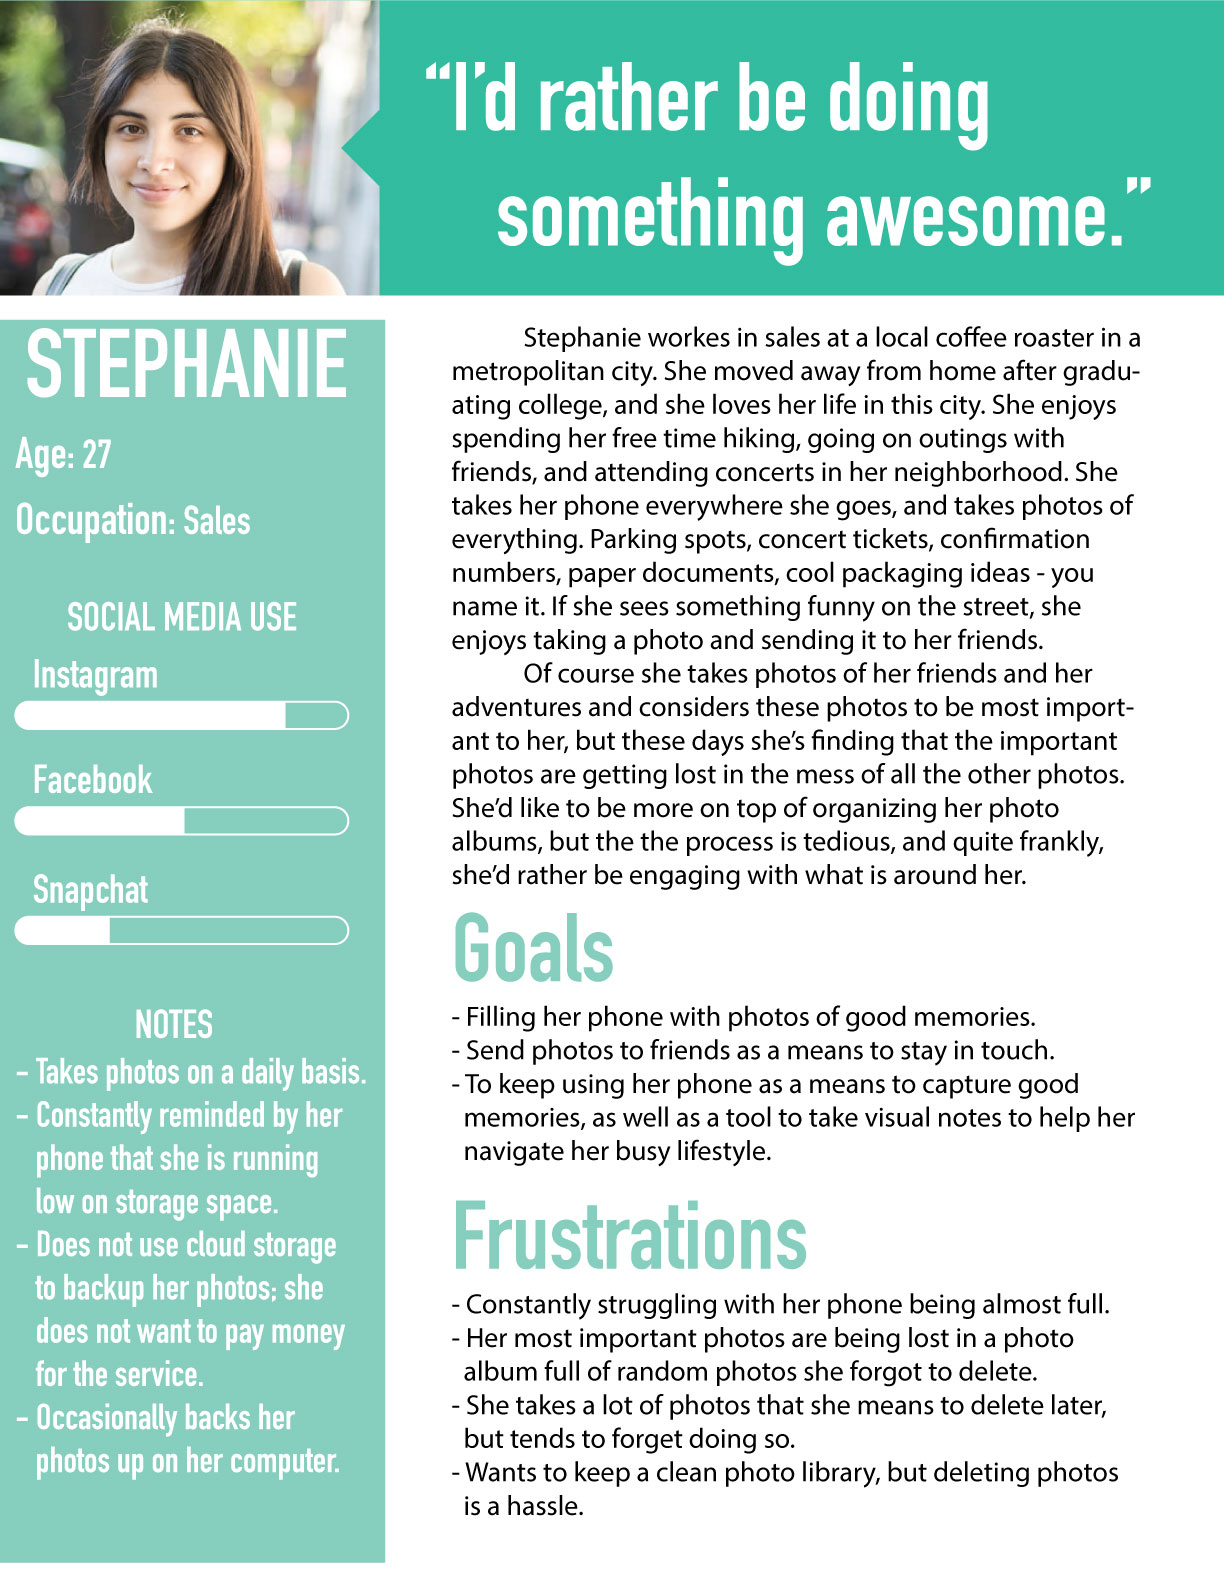 Persona: Stephanie